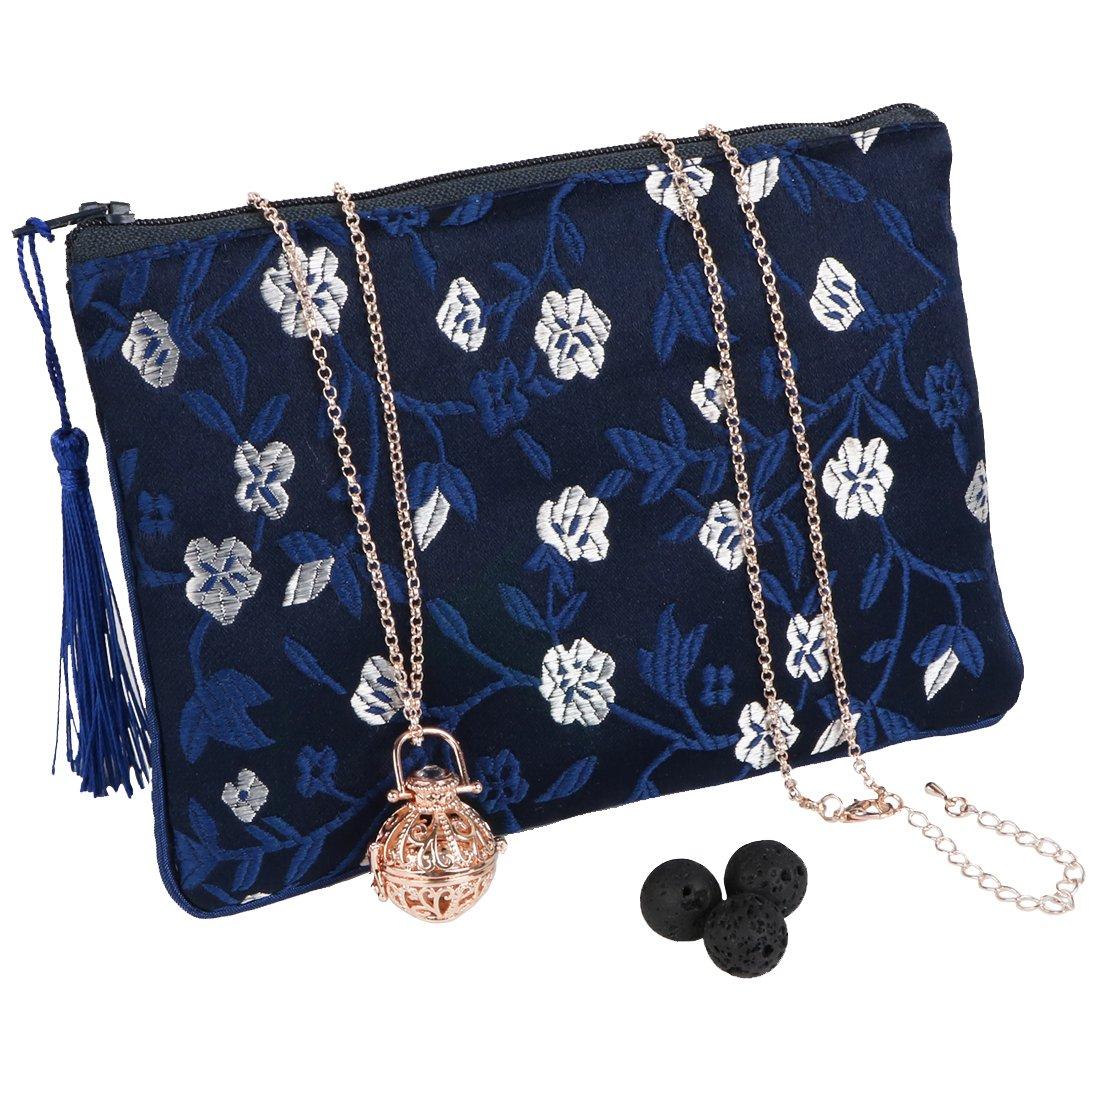 MyKazoe Essential Oil Diffuser Necklace (3 Lava Stones Included) With BONUS Essential Oil Storage Bag (Rose Gold/Navy Blue)